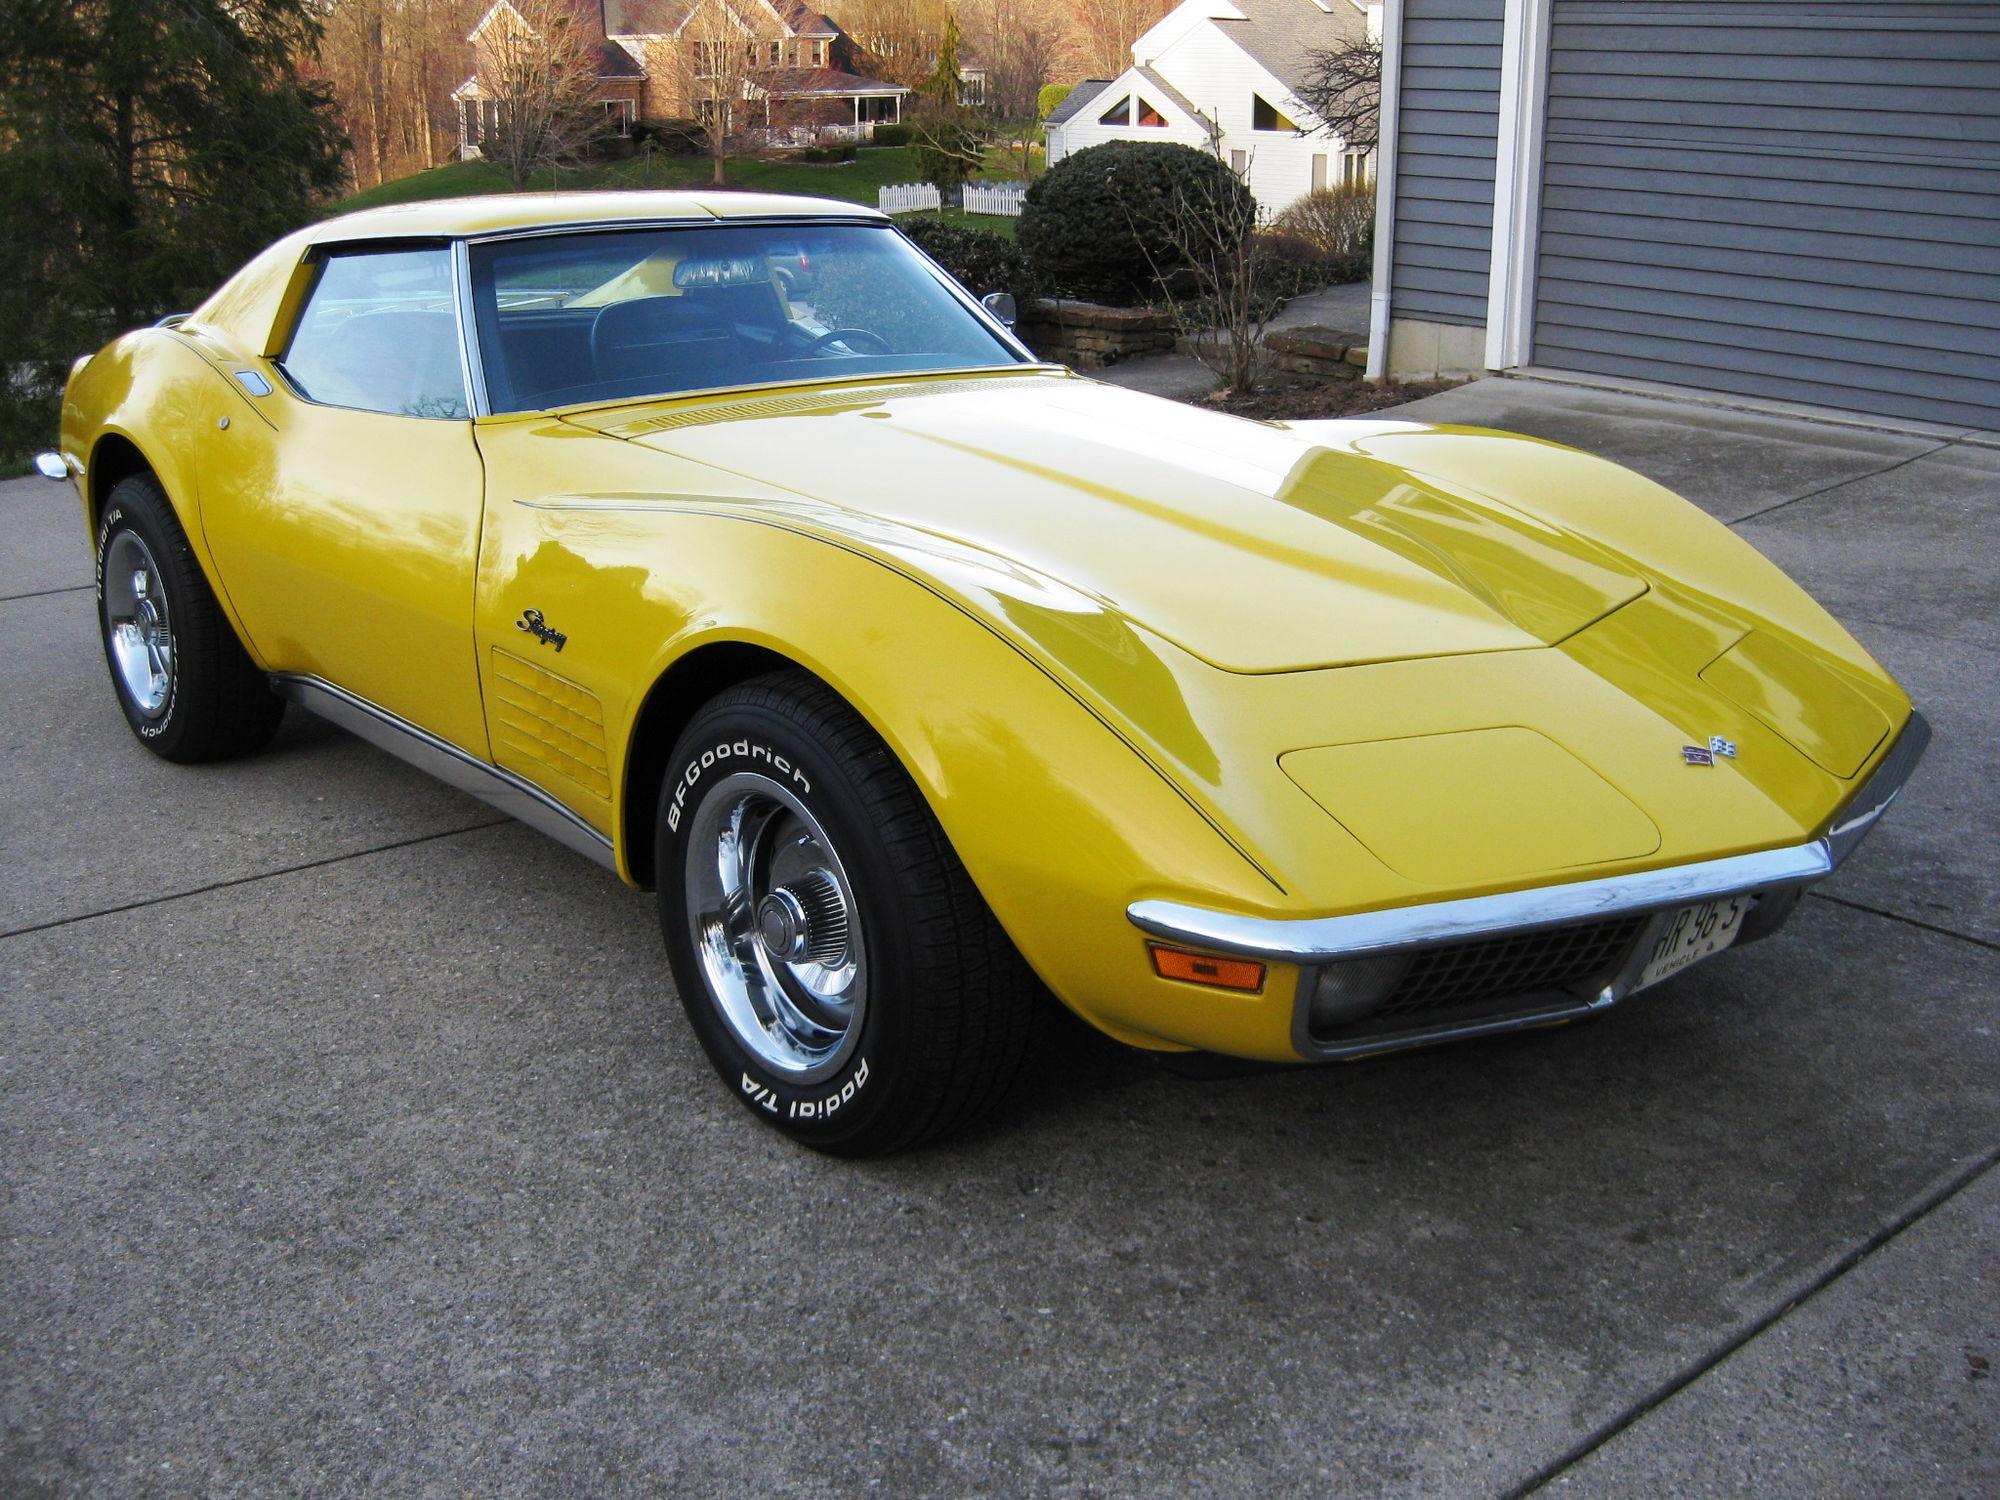 Best Way To Sell My 1971 Corvette ??? - CorvetteForum - Chevrolet ...